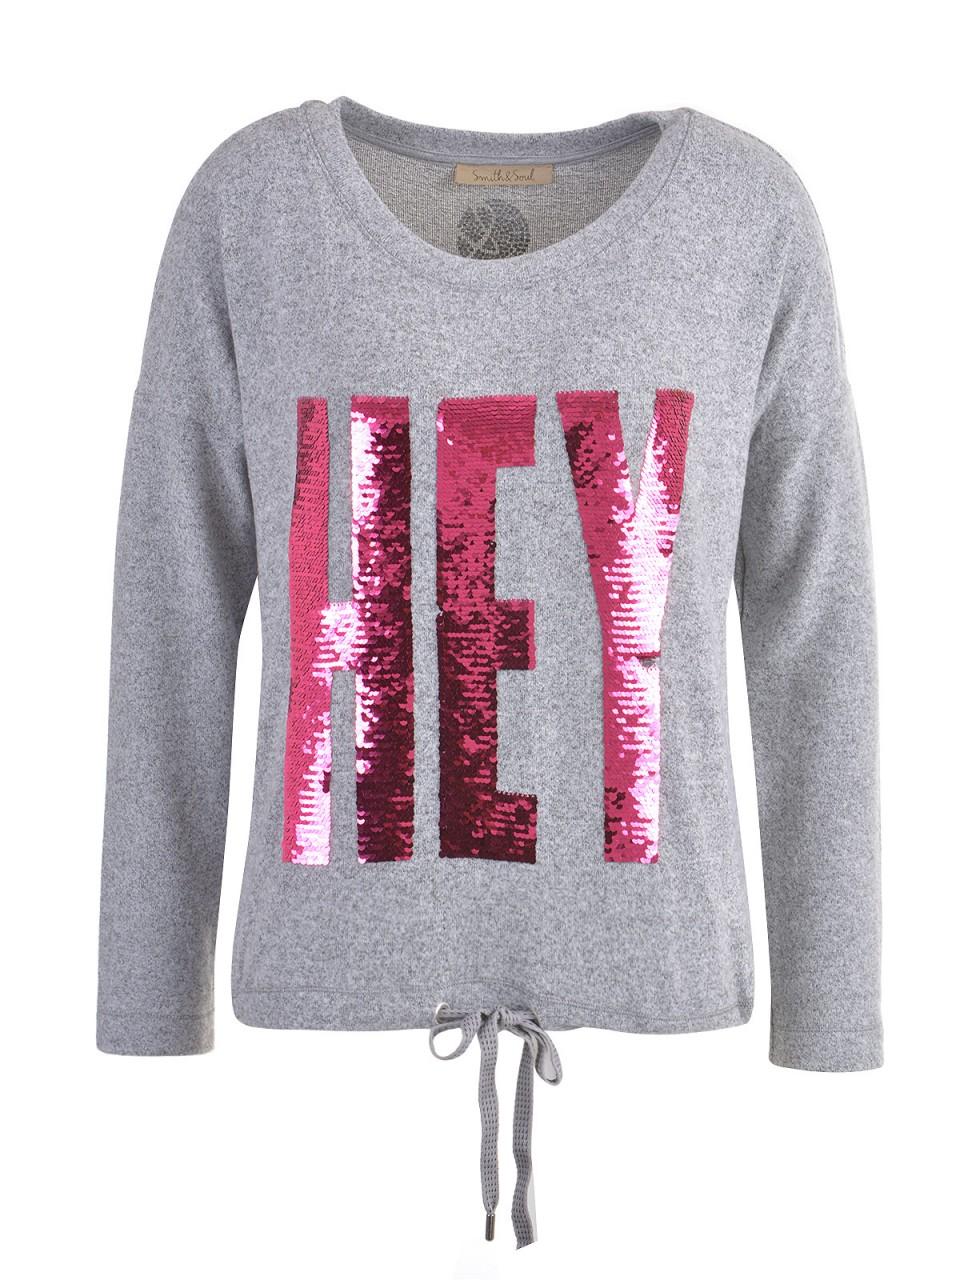 Oberteile - SMITH SOUL Damen Sweatshirt, grau  - Onlineshop Designermode.com